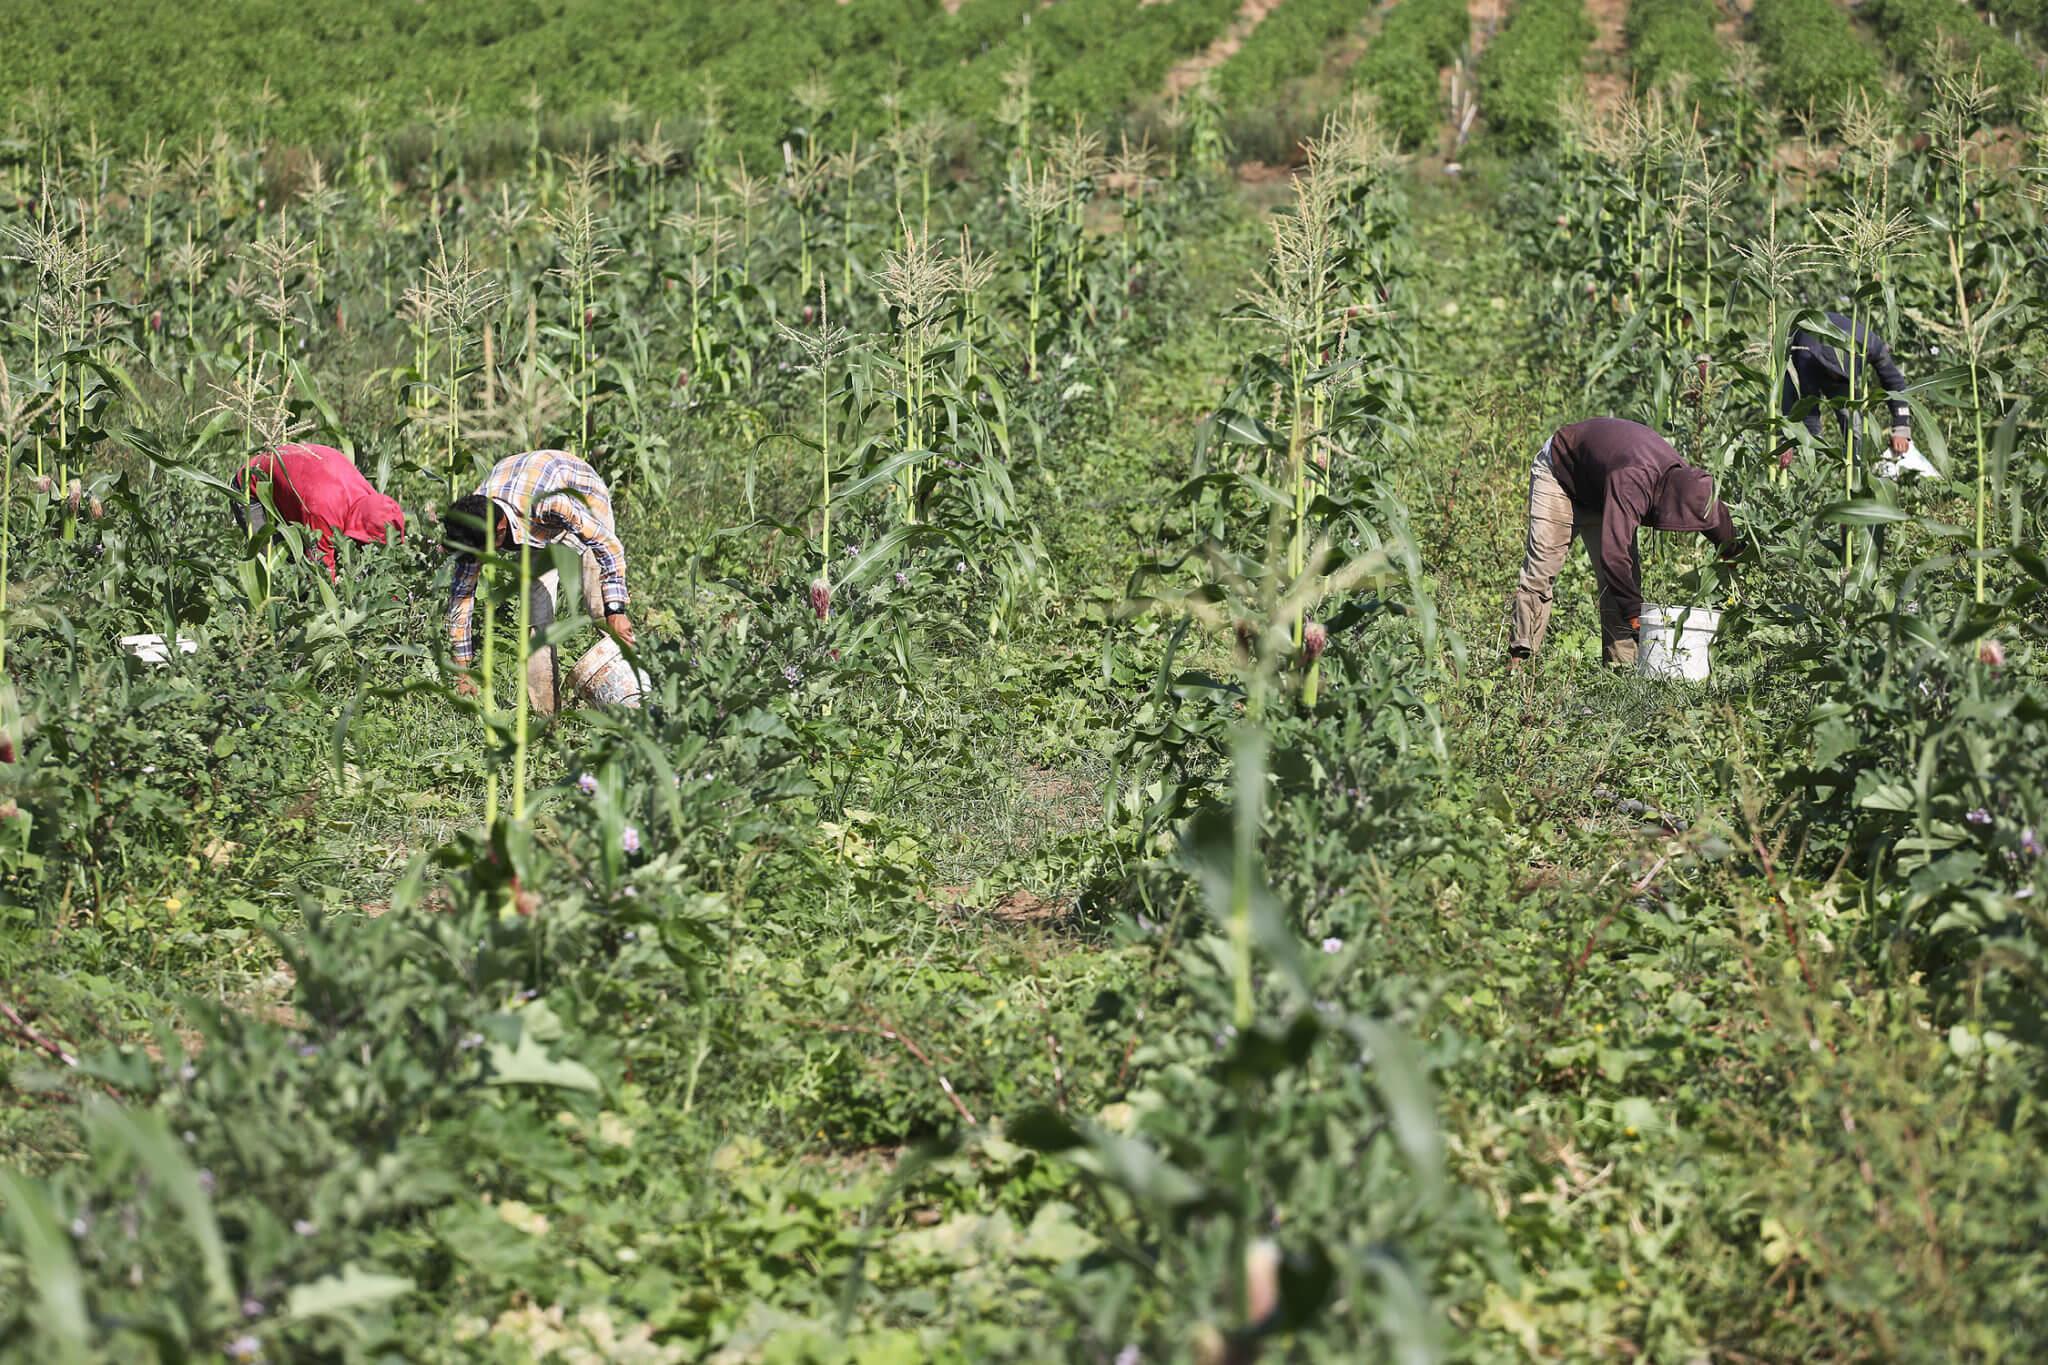 Gaza farmers harvest corn crops.